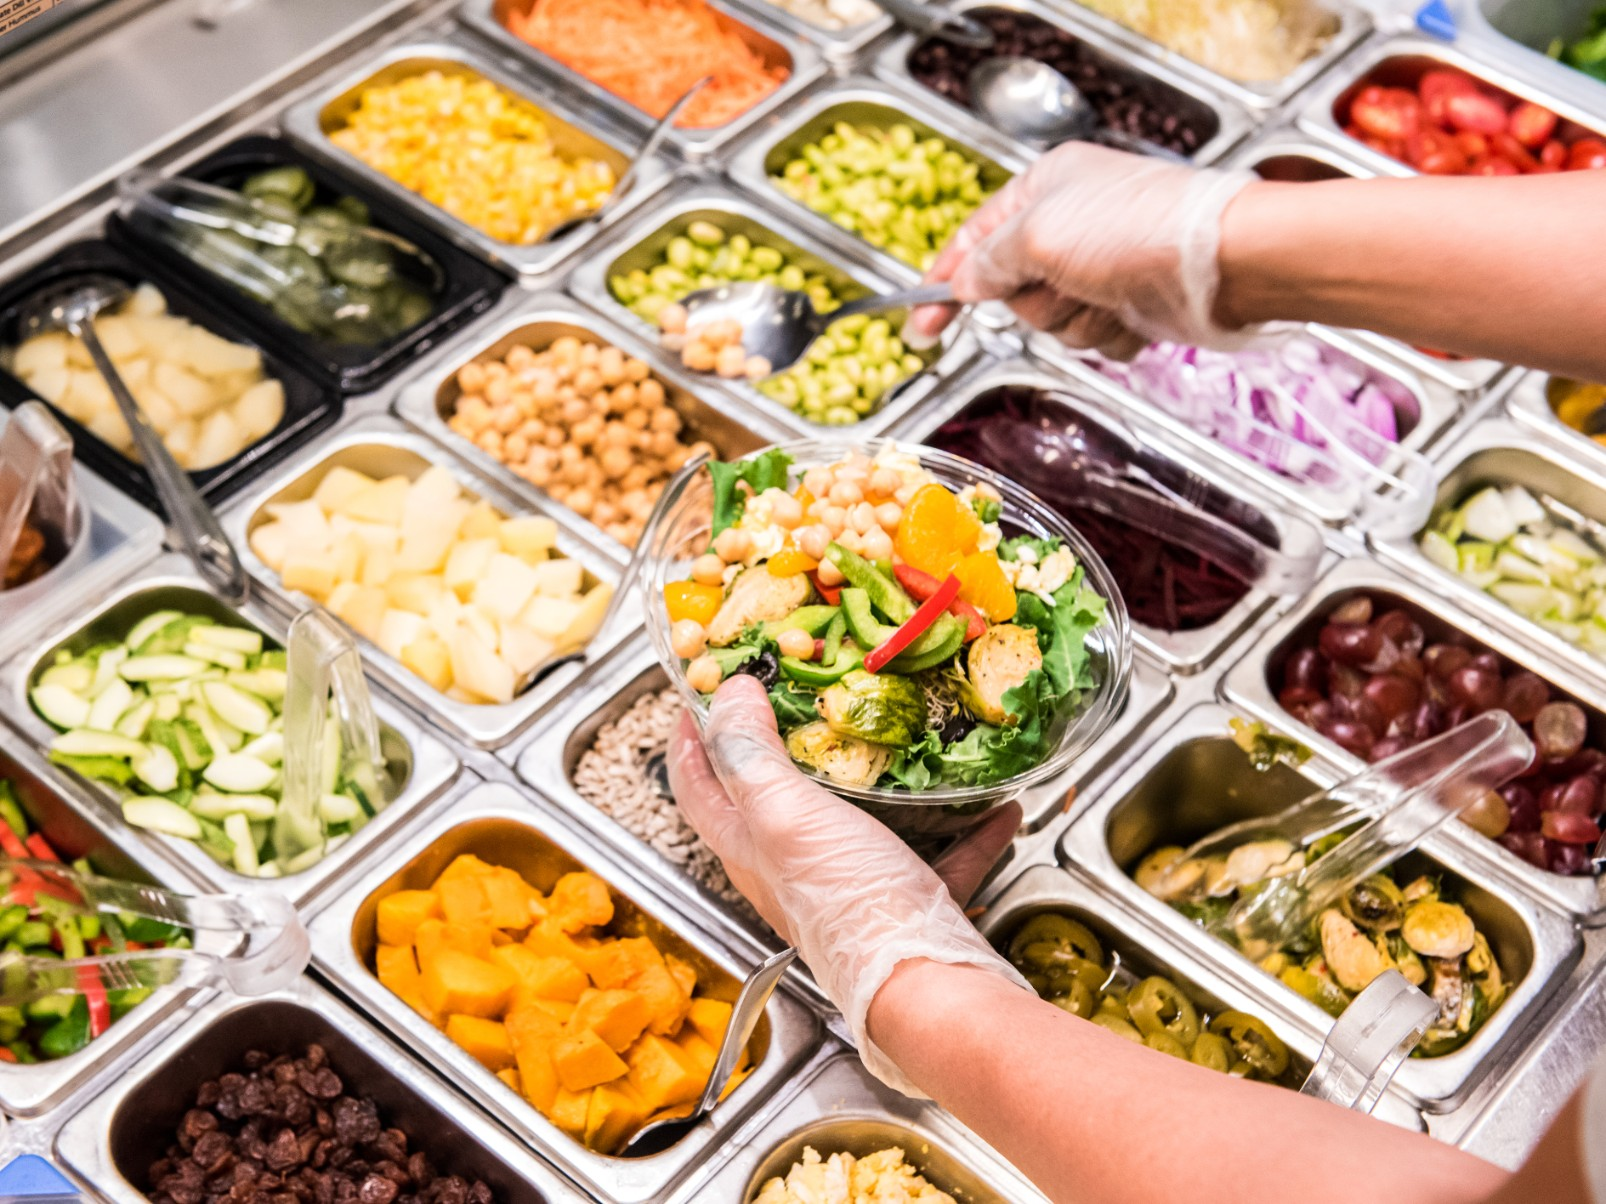 SaladStop! (Marina Bay Link Mall) - Dine, Shop, Earn